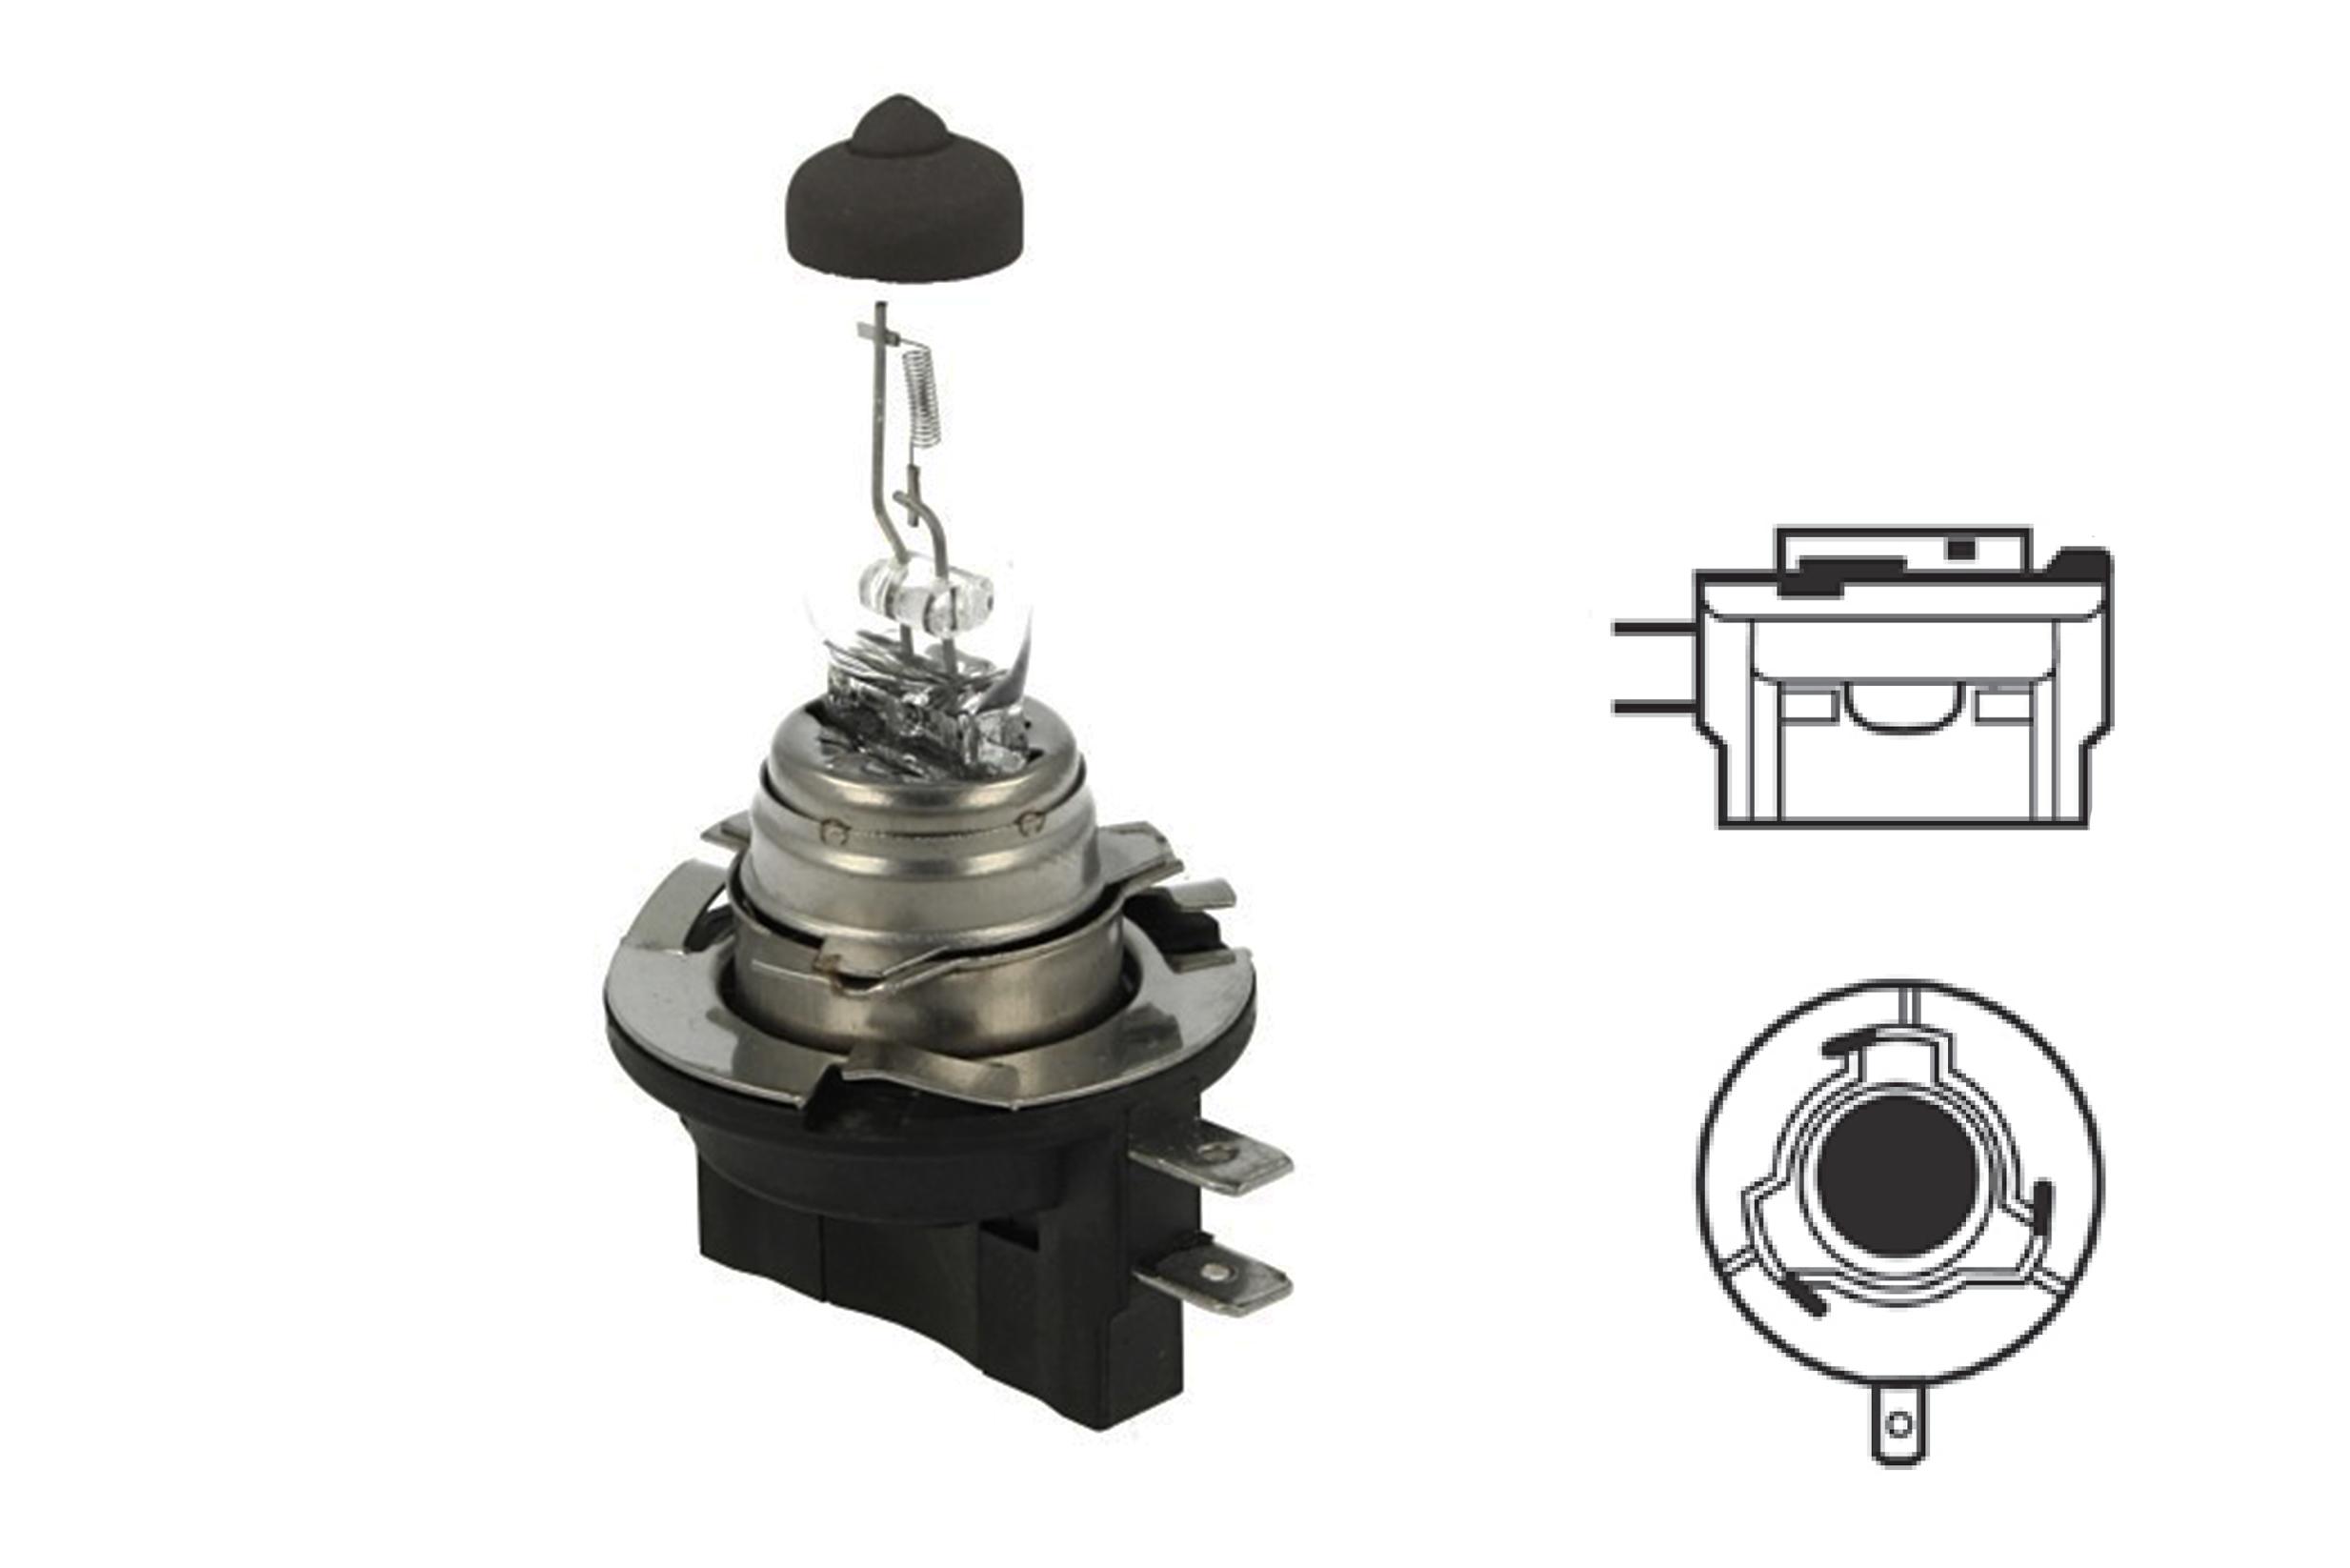 Lampada Alogena H8B 12V 35W PGJY19-1 Clear Compatibile Osram OA64242 - PZ